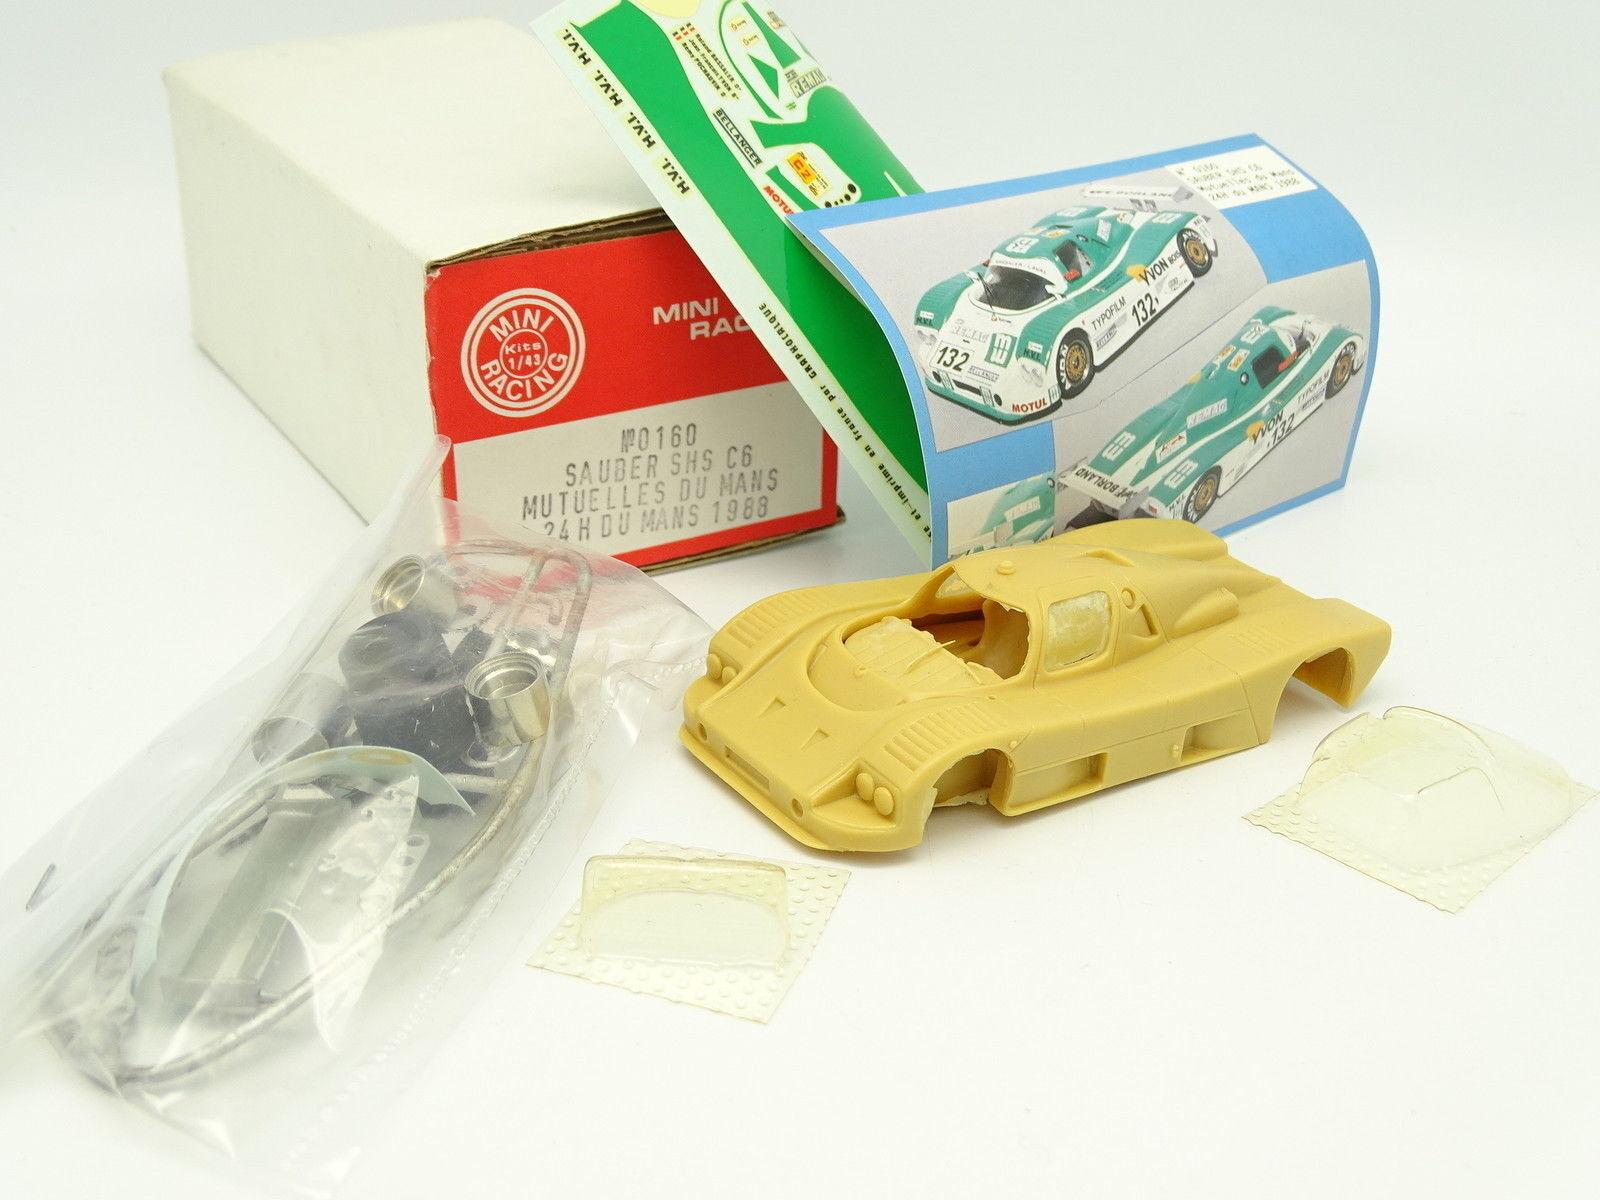 Mini Carreras Juego 1 43 - Sauber Shs C6 Mutuas de Mans Le Mans 1988